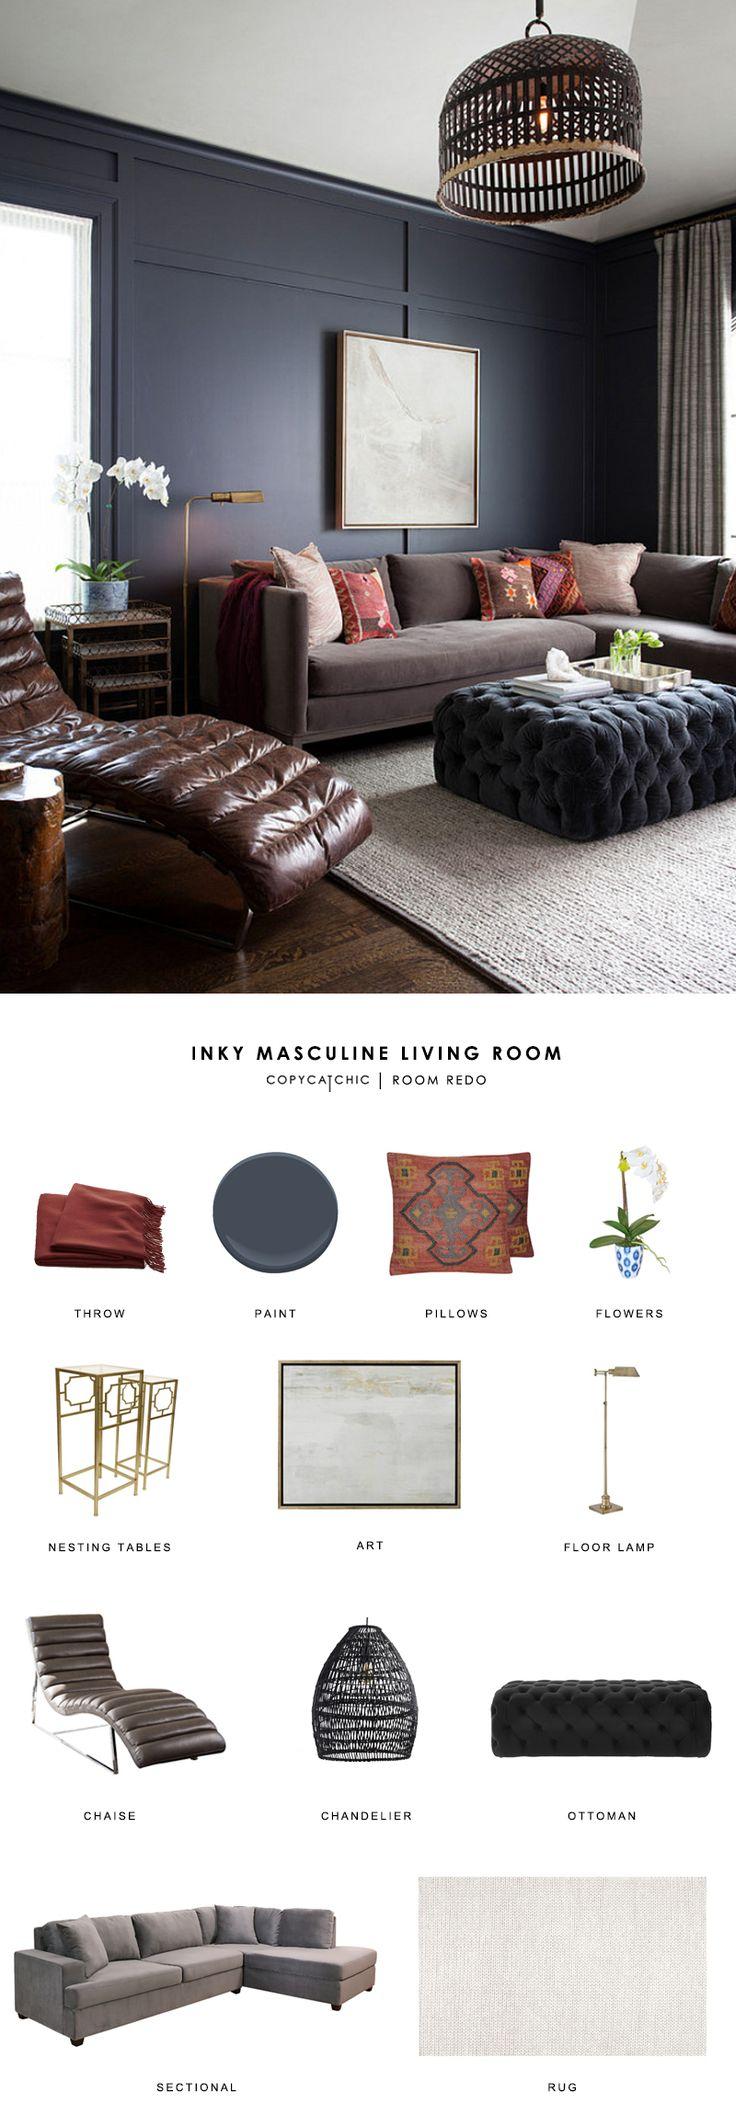 Copy Cat Chic Room Redo | Inky Masculine Living Room